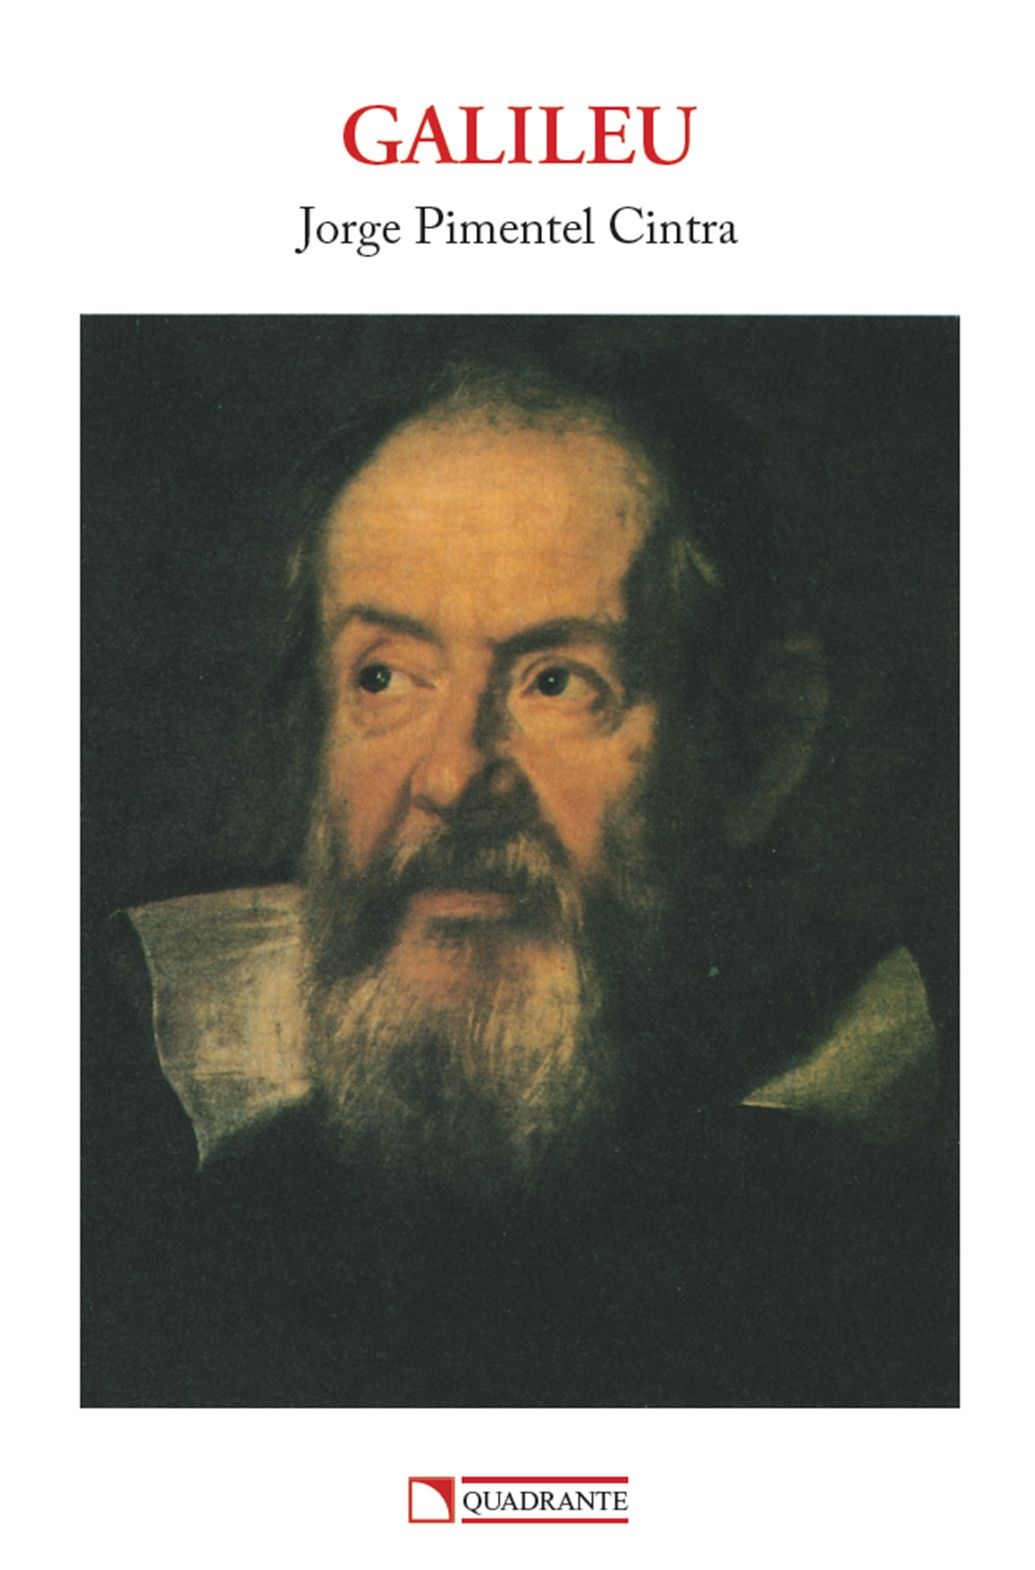 Livro Galileu